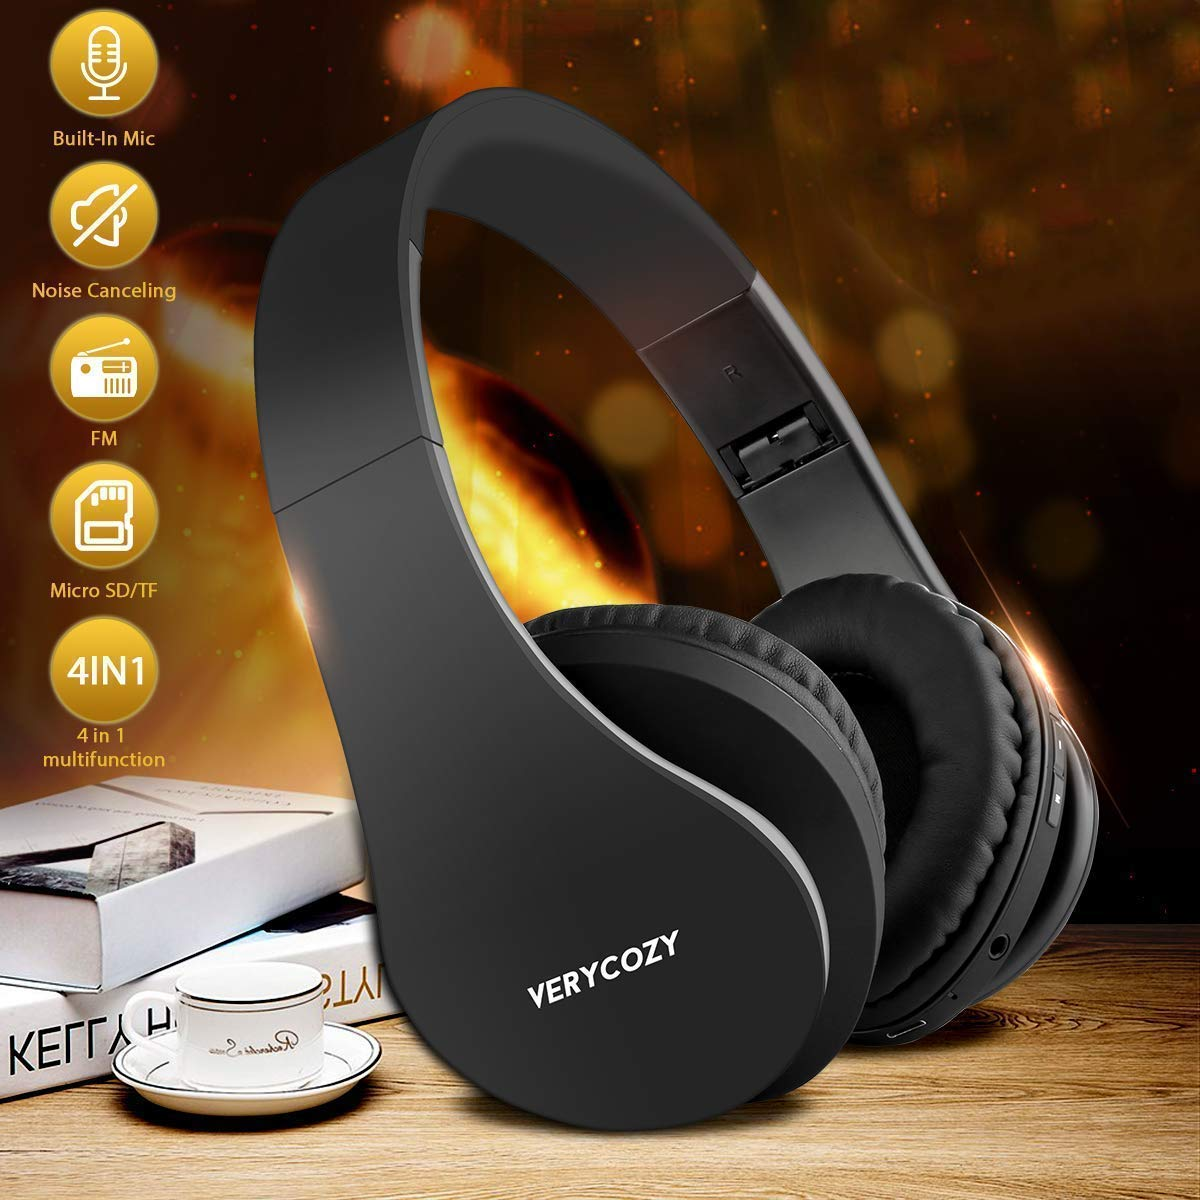 Over-Ear Headphones Bluetooth Headphones Hi-Fi Stereo Wireless Headset Over Ear Headphones Noise Cancelling Foldable Earphones